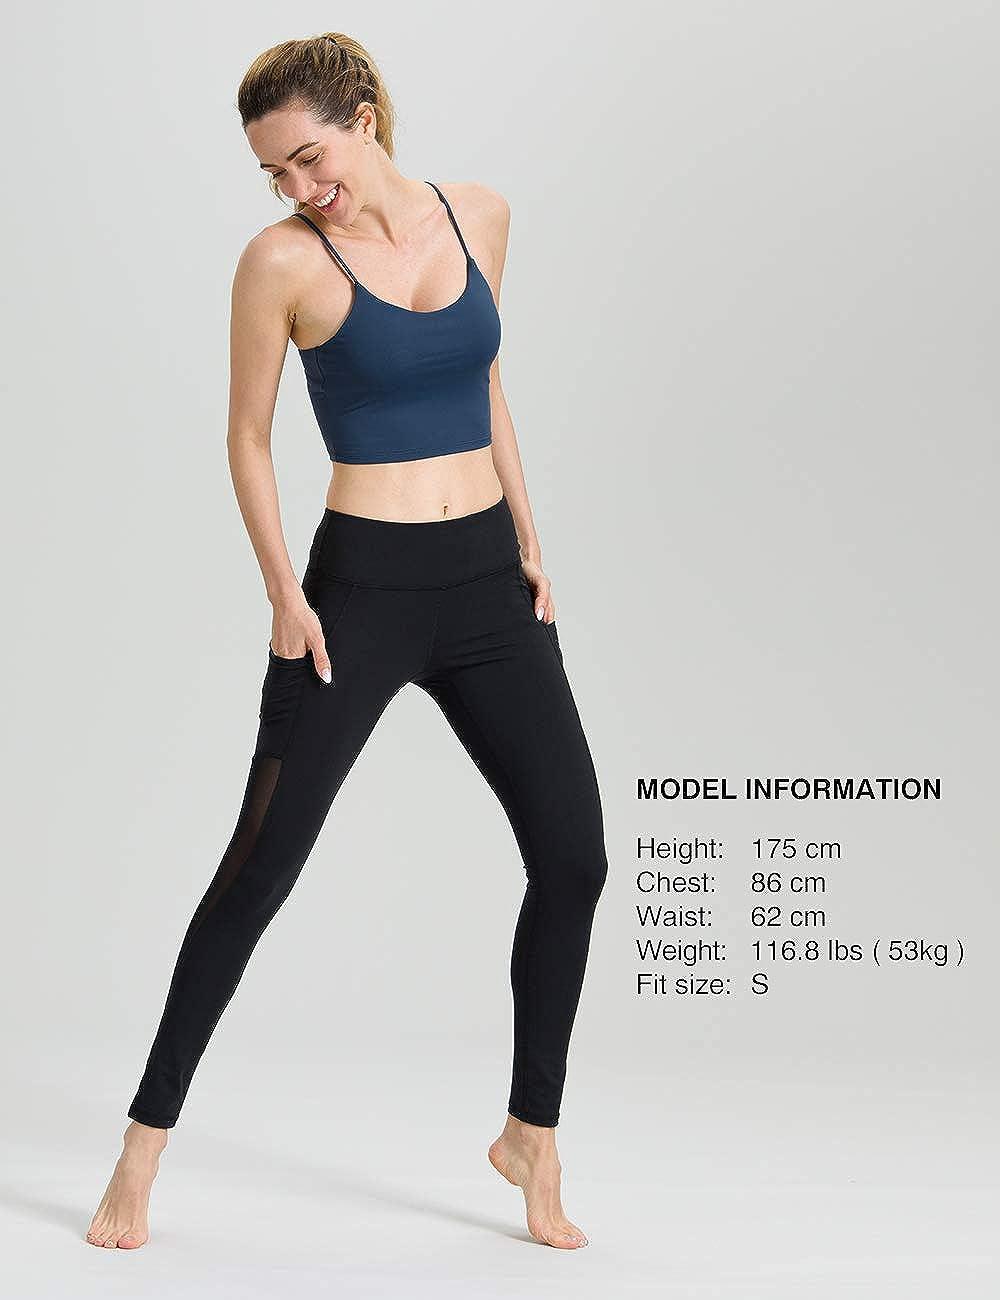 ALONG FIT Sport Leggings mit Taschen Damen Sporthose Yogahose Fitnesshose Yoga Leggings f/ür Damen